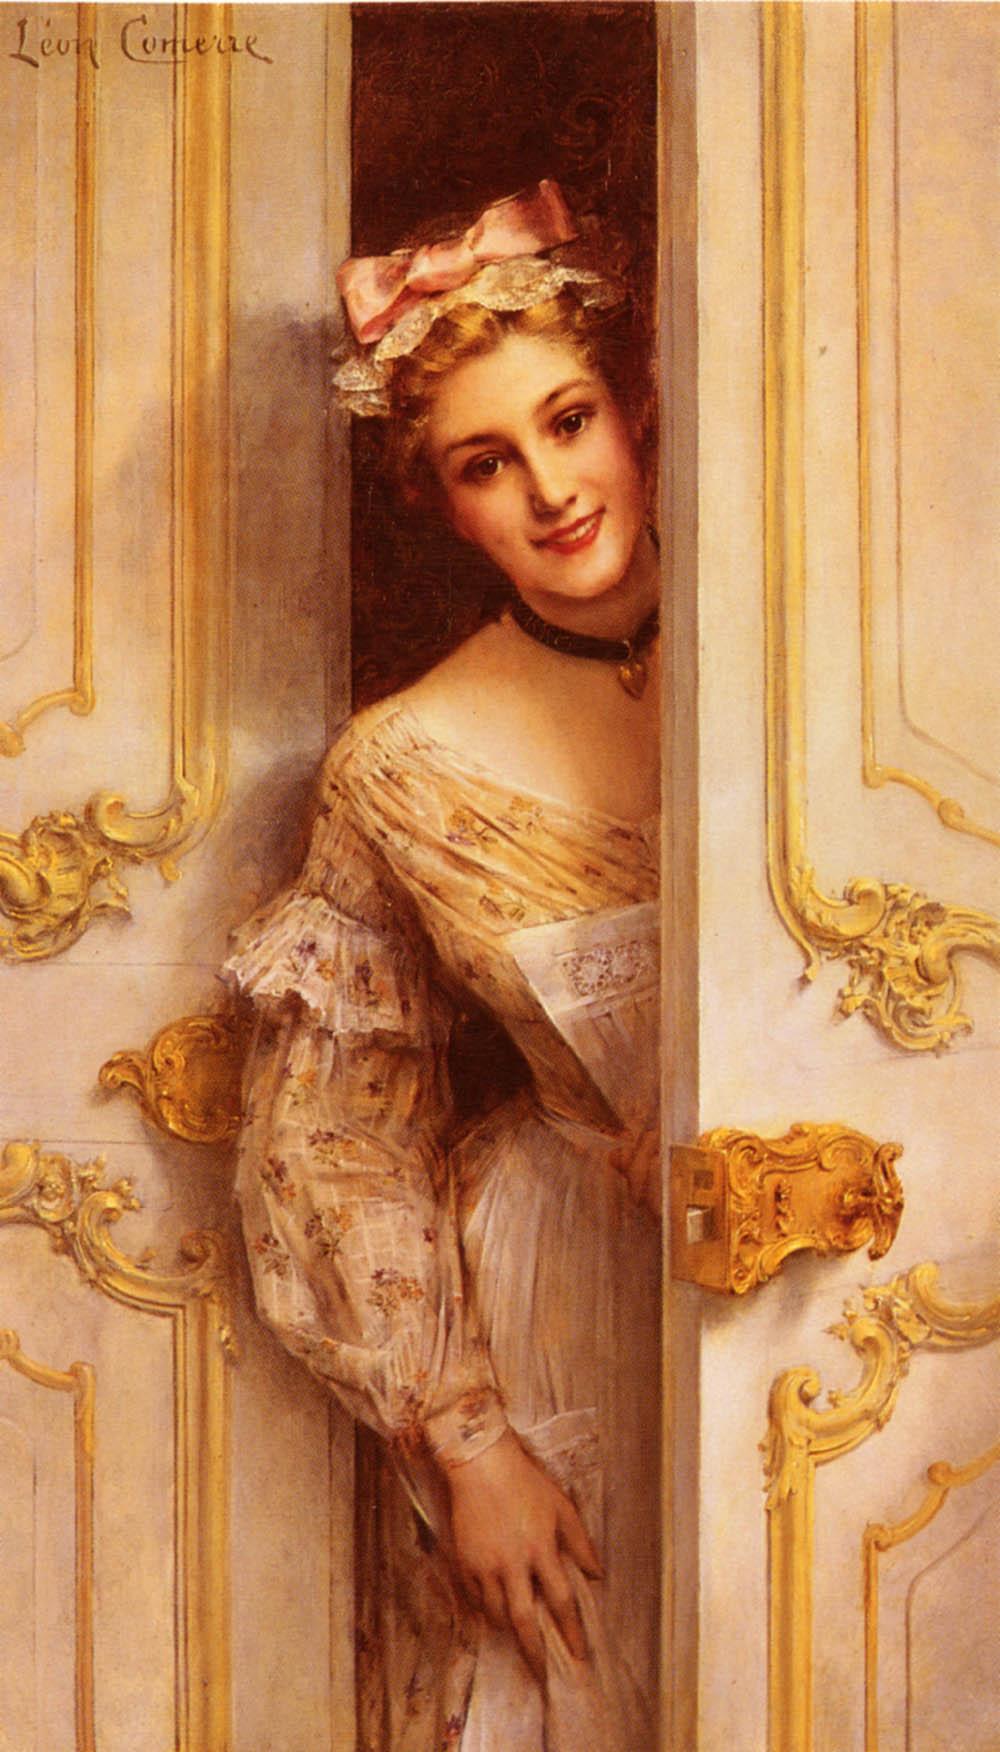 LES TRESORS DE LEON- FRANCOIS COMERRE  Comerre,_Leon_Francois%3B_The_Pretty_Maid